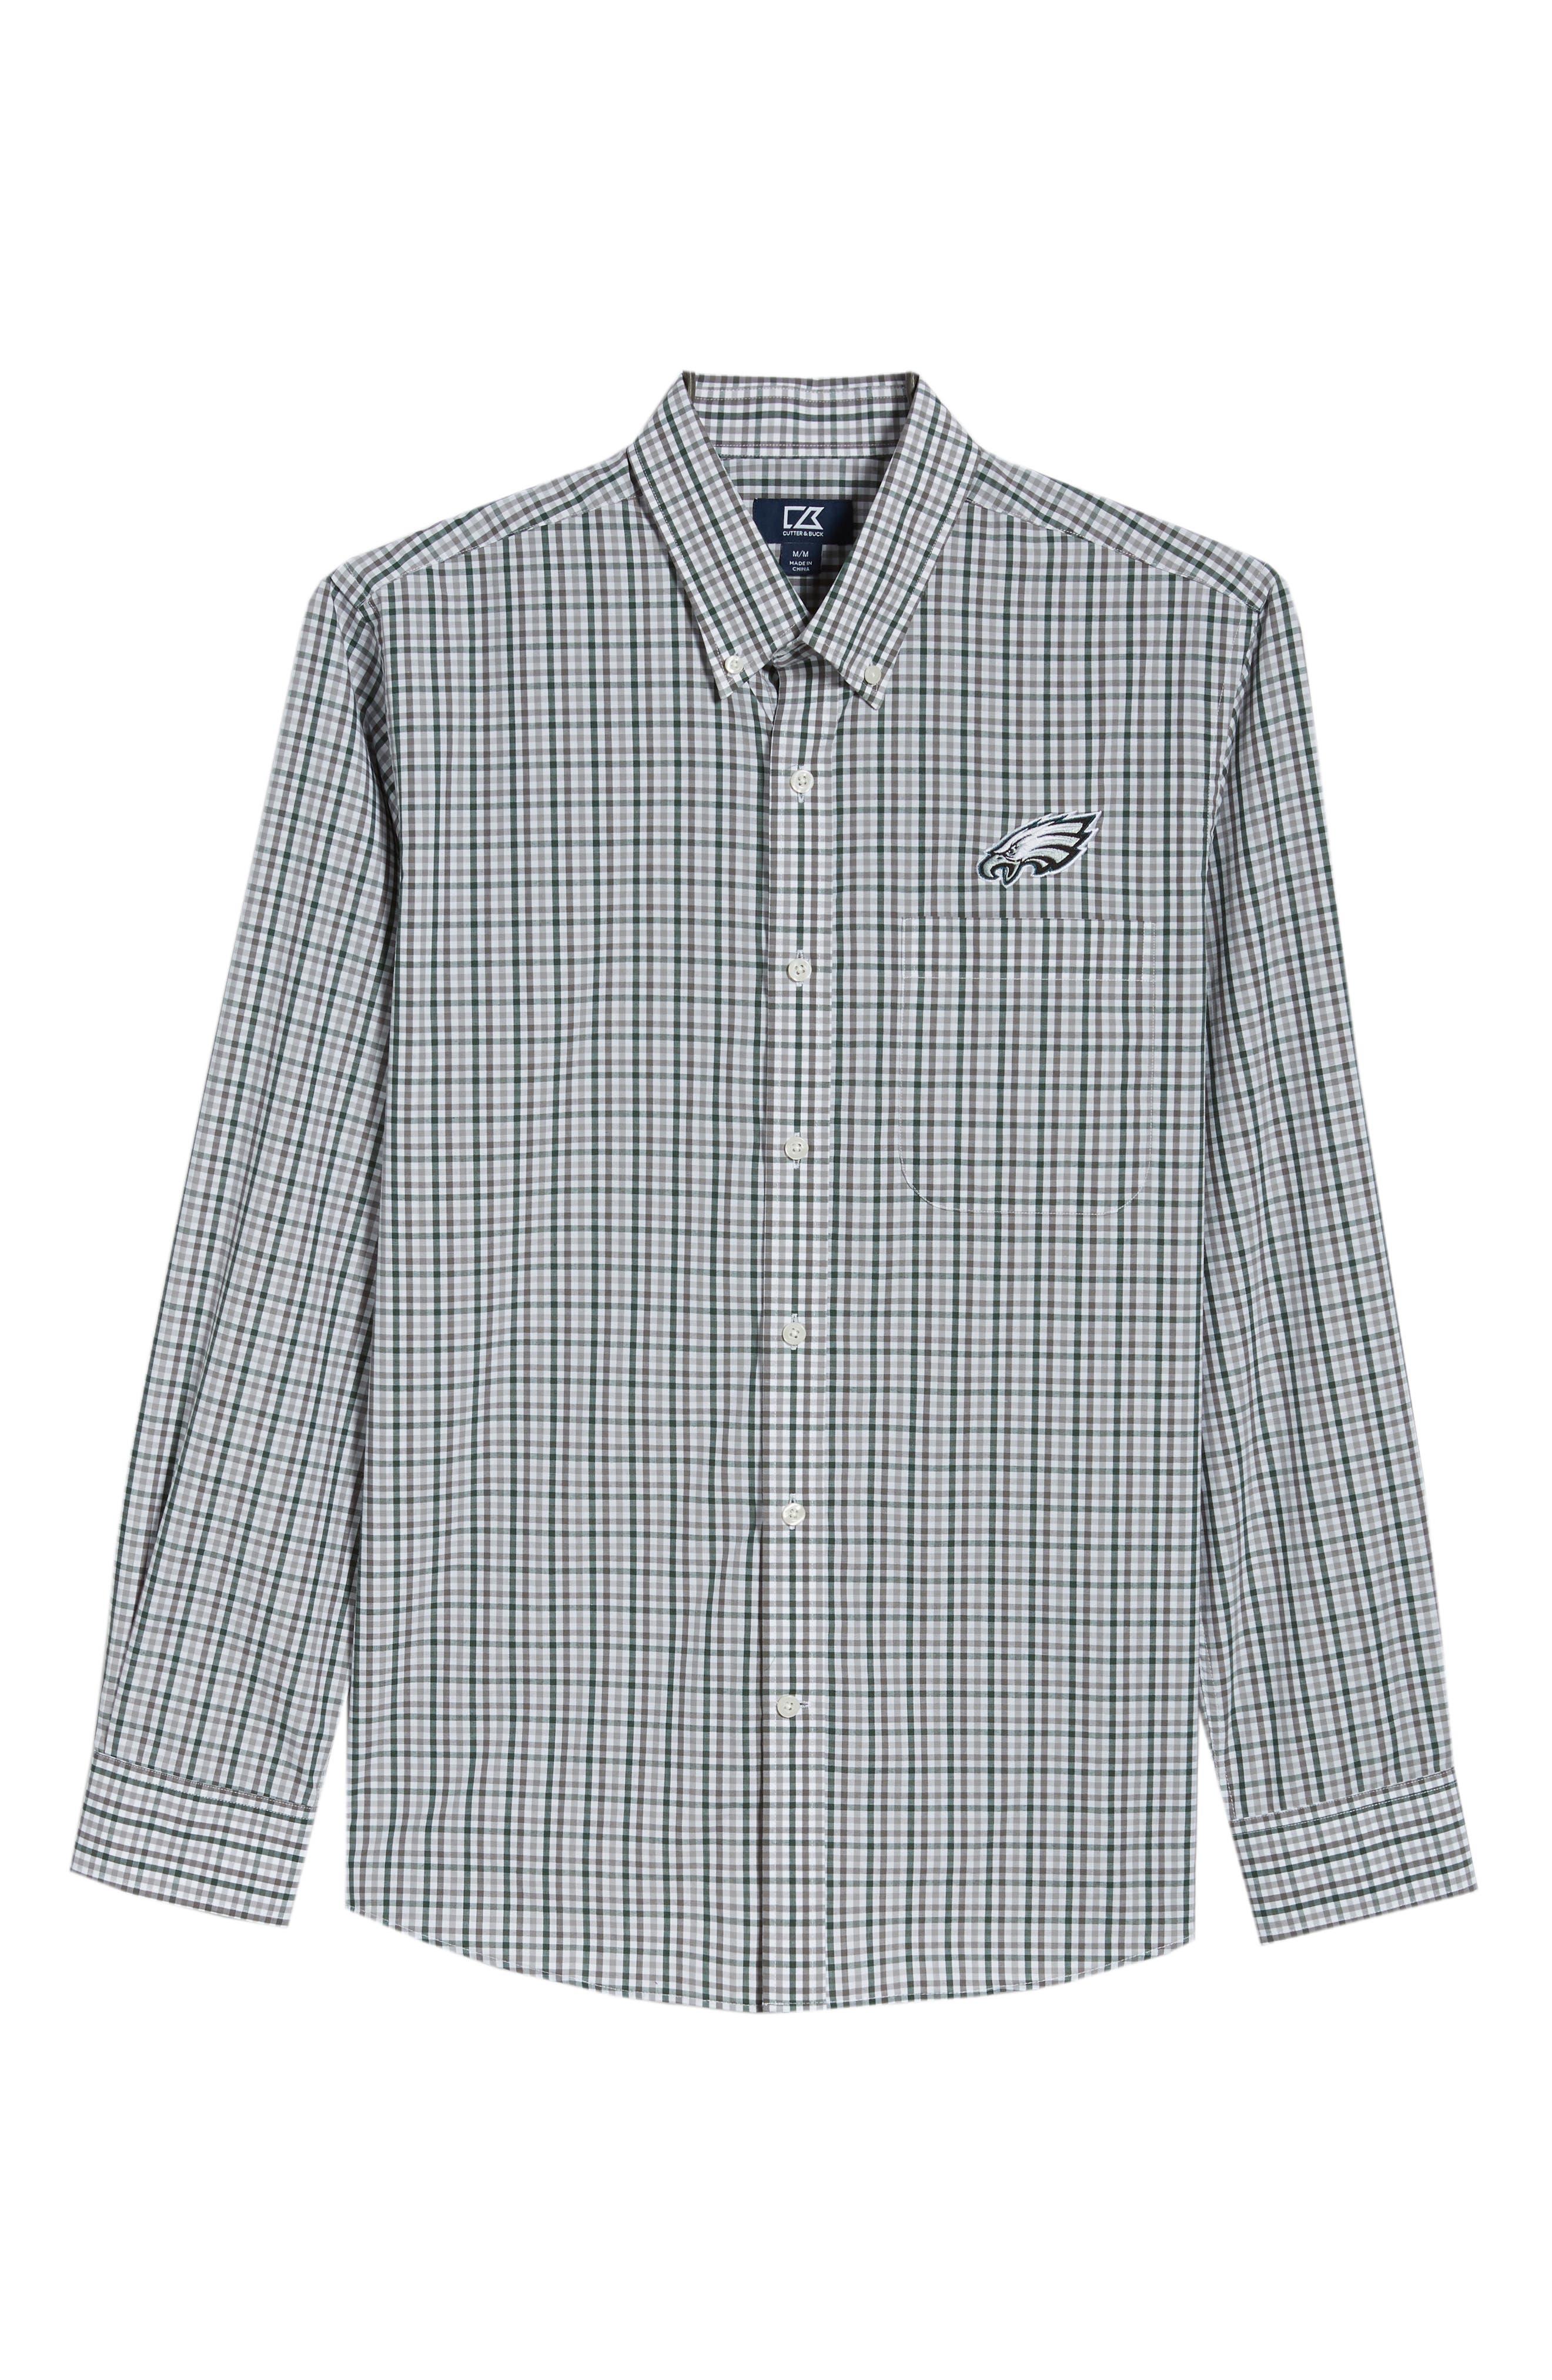 Philadelphia Eagles - Gilman Regular Fit Plaid Sport Shirt,                             Alternate thumbnail 6, color,                             HUNTER